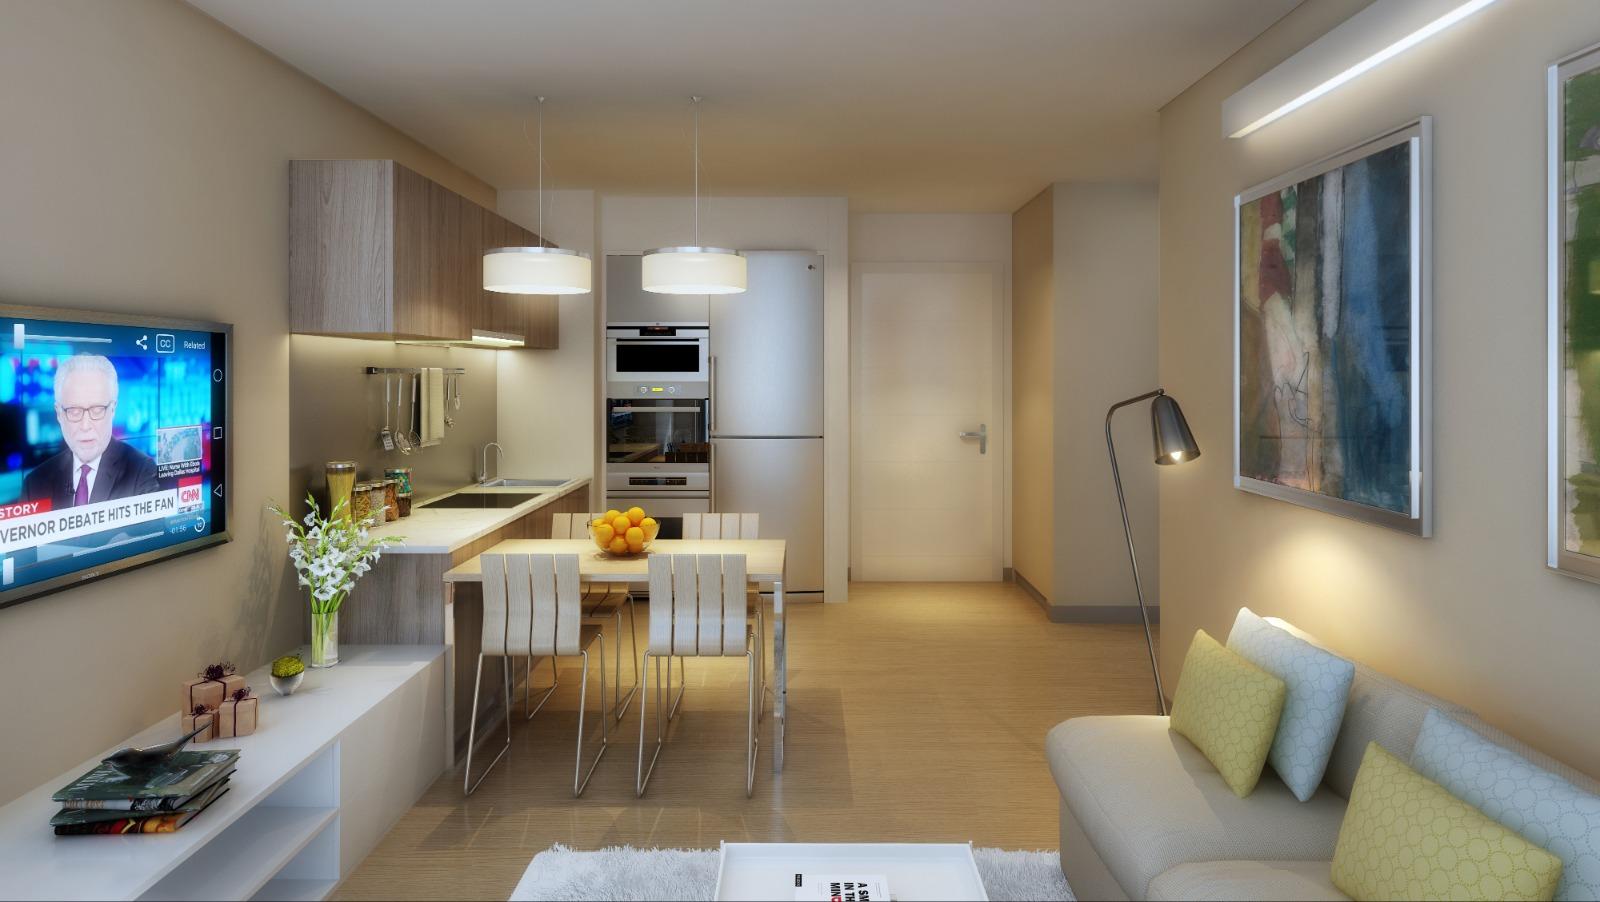 Бизнес-центр с жилыми апартаментами в Атакёе - Фото 18